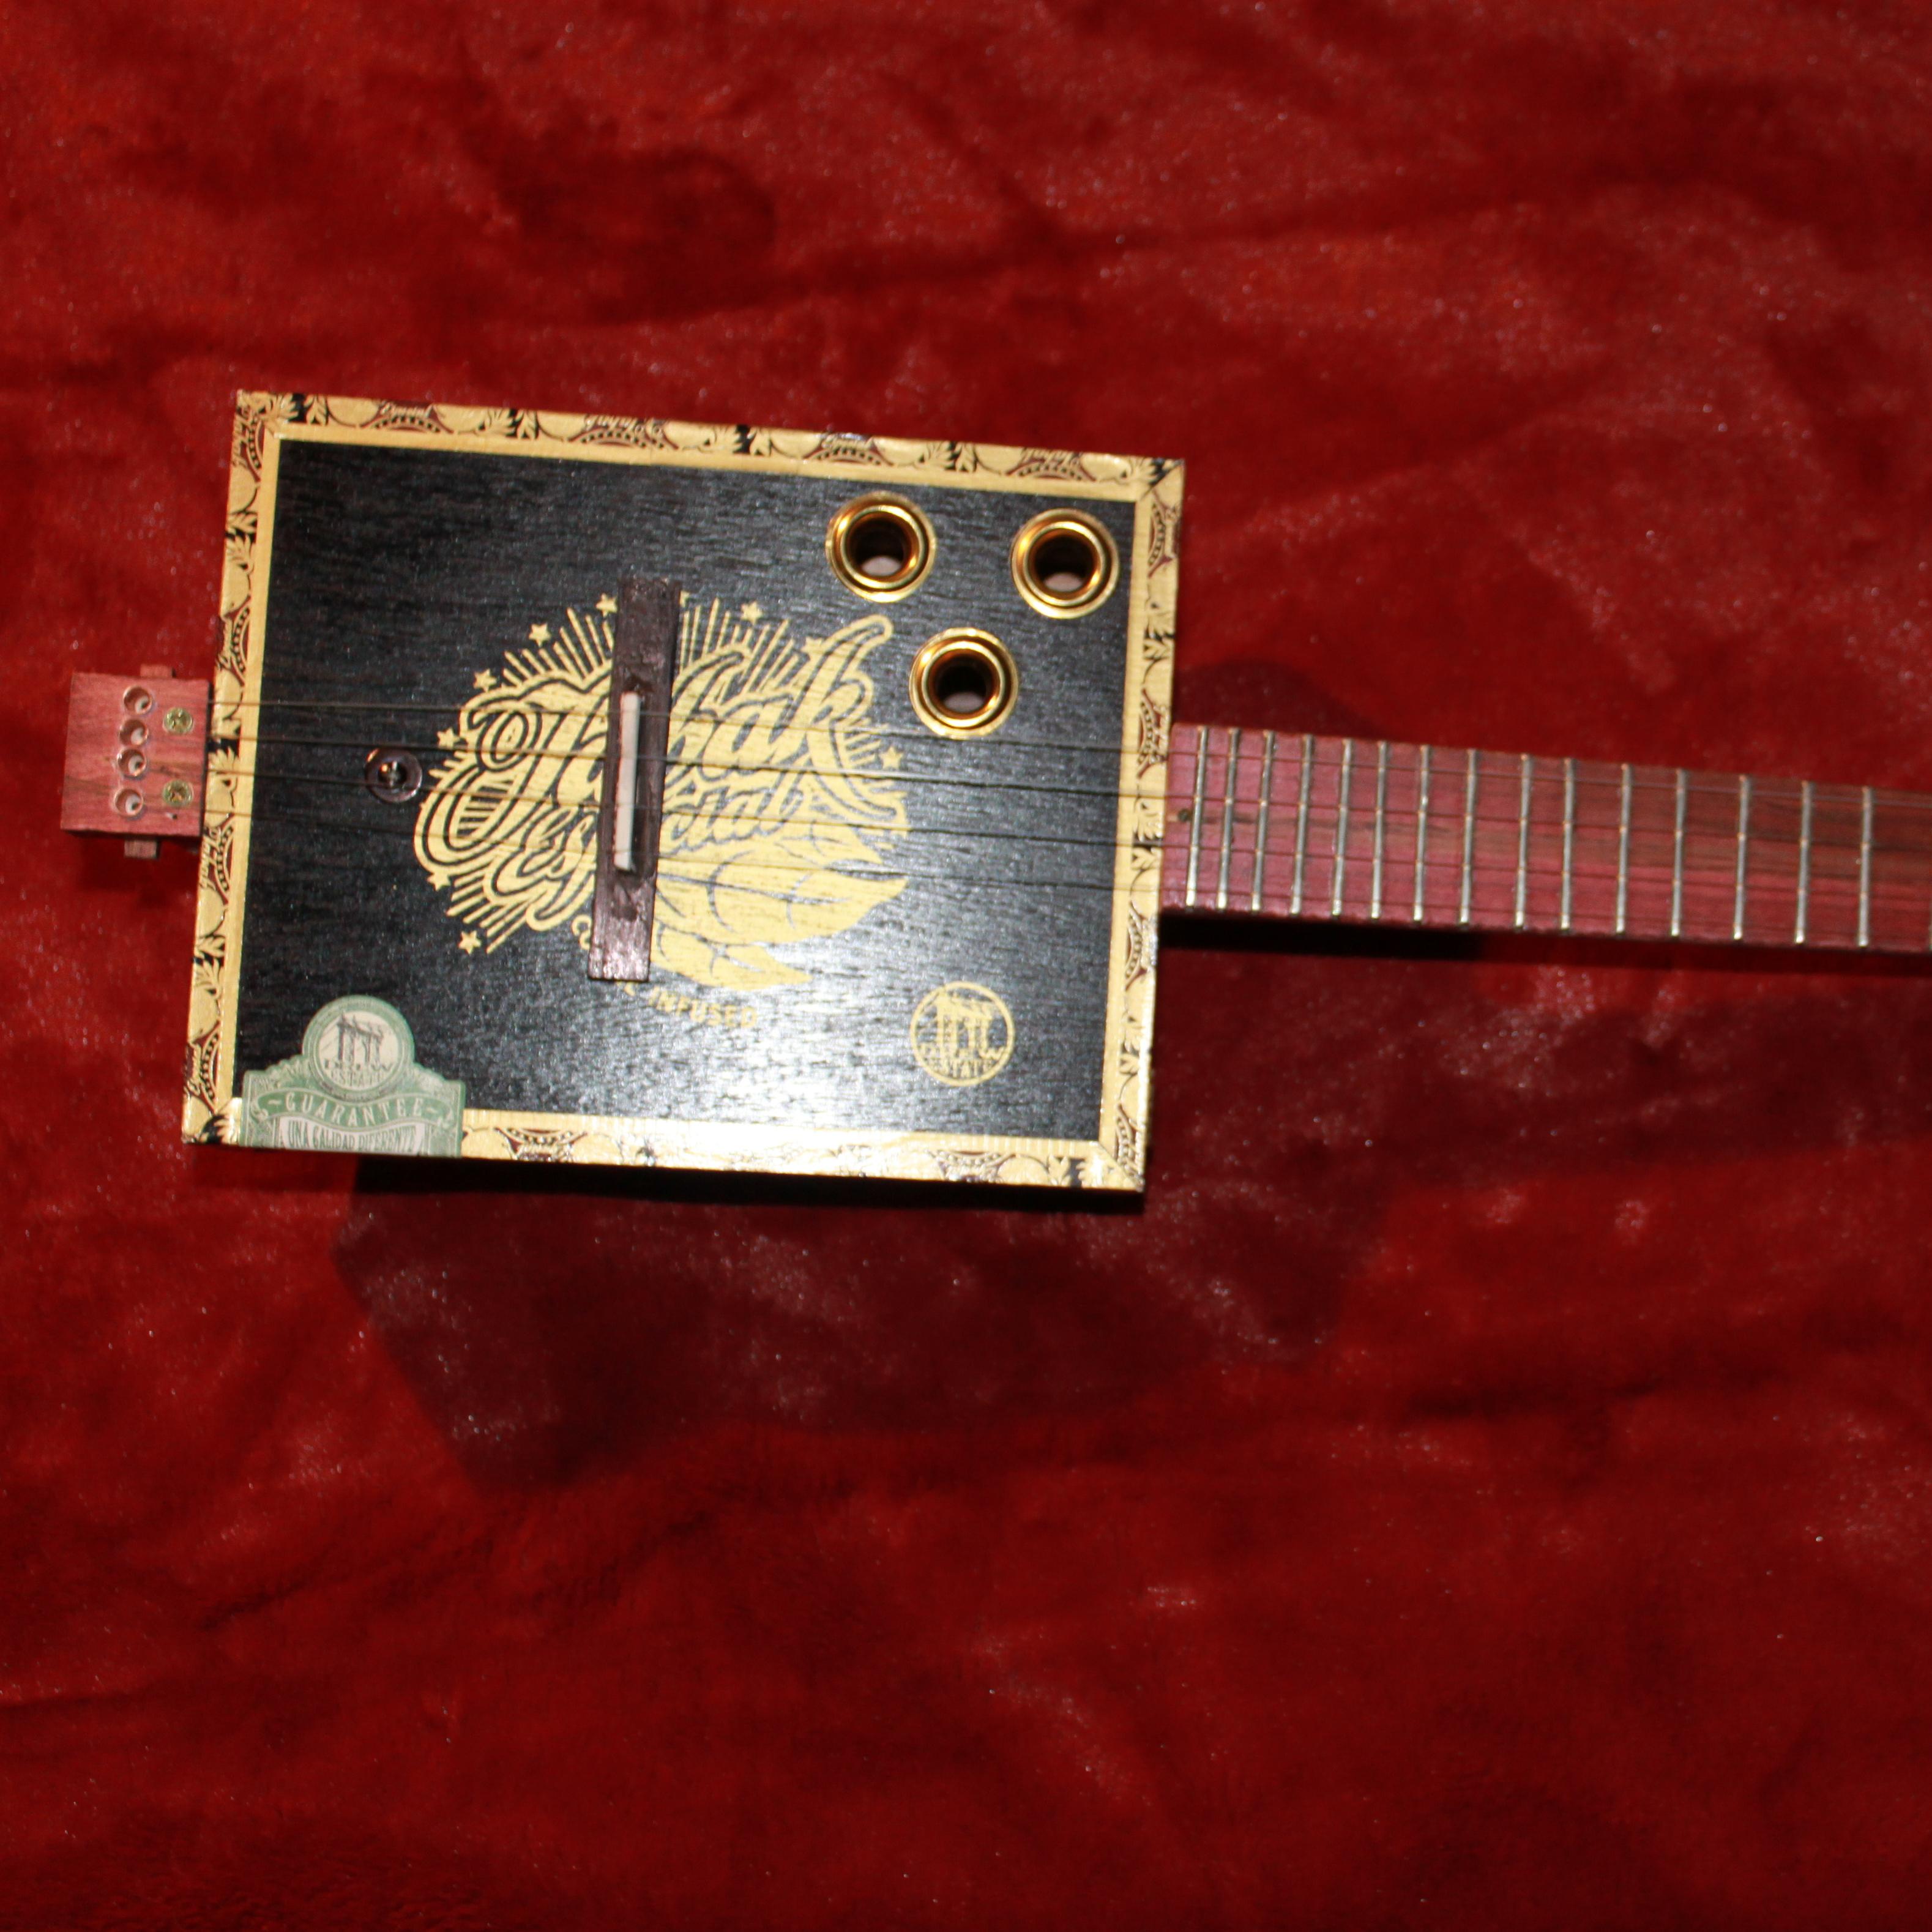 Cigar Box Basses Nation Wiring A Single Two Wire Humbucker 3 String Bass Guitar Parts